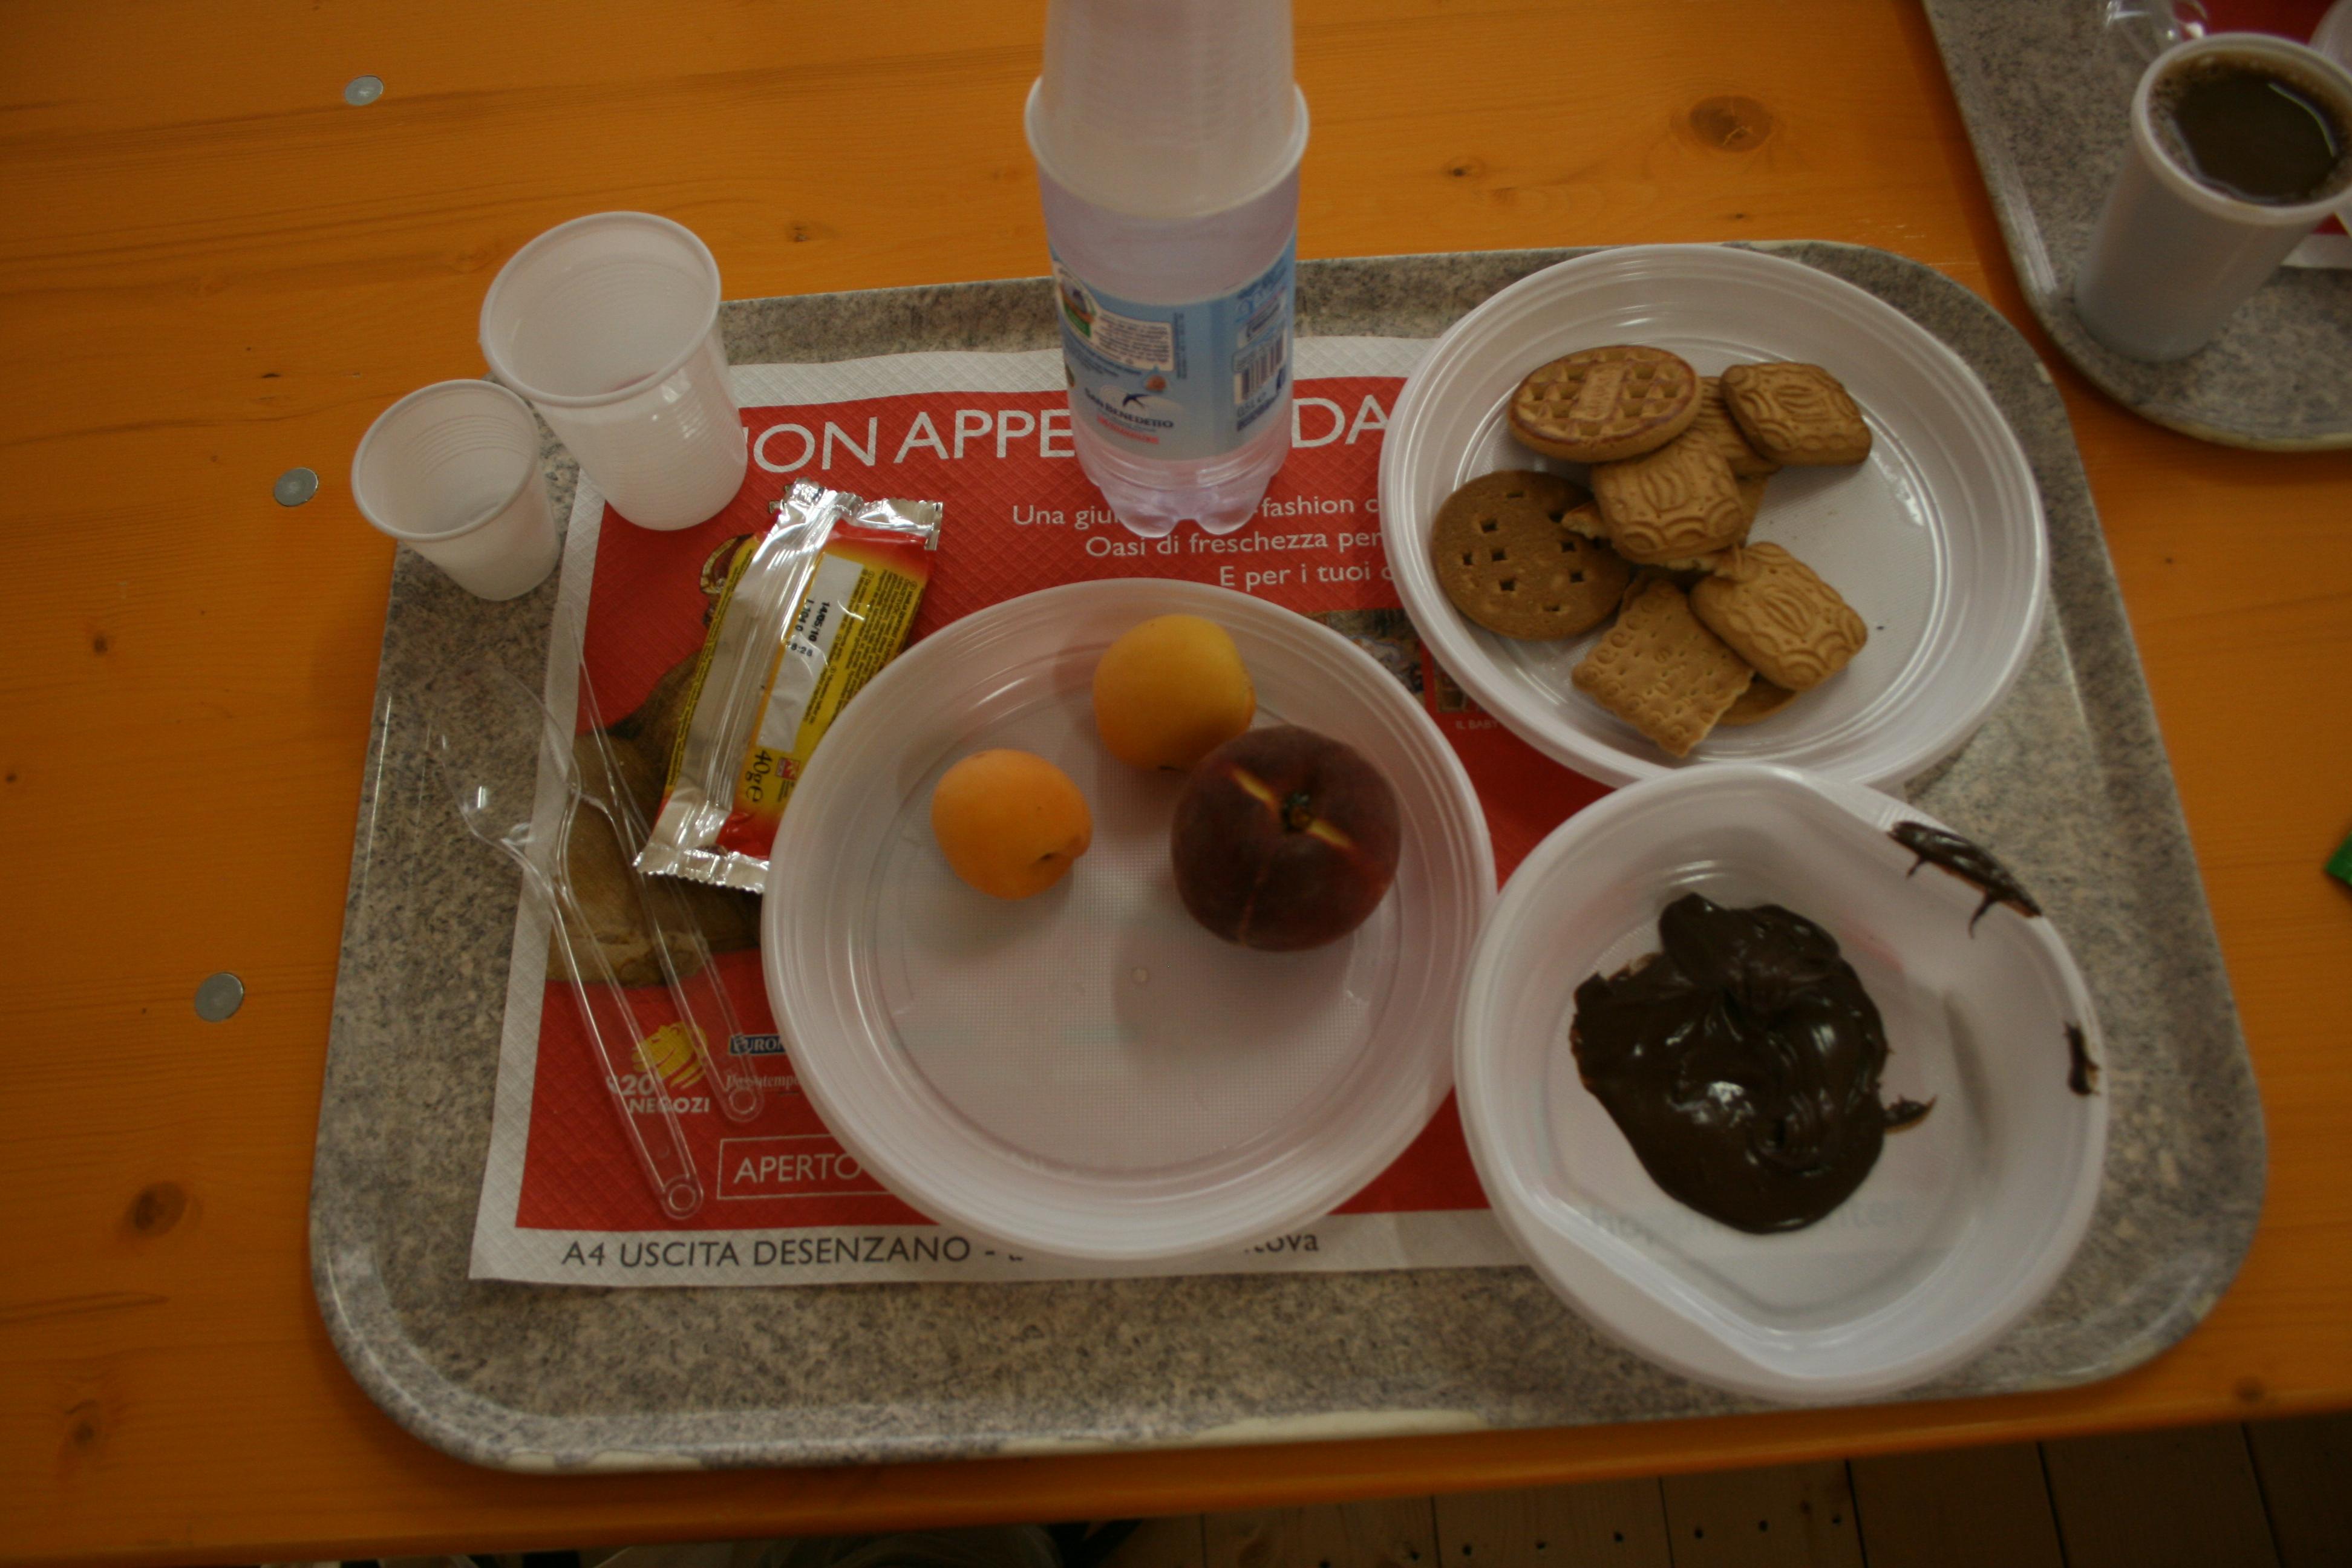 Nutella for breakfast?  I LOVE ITALY!